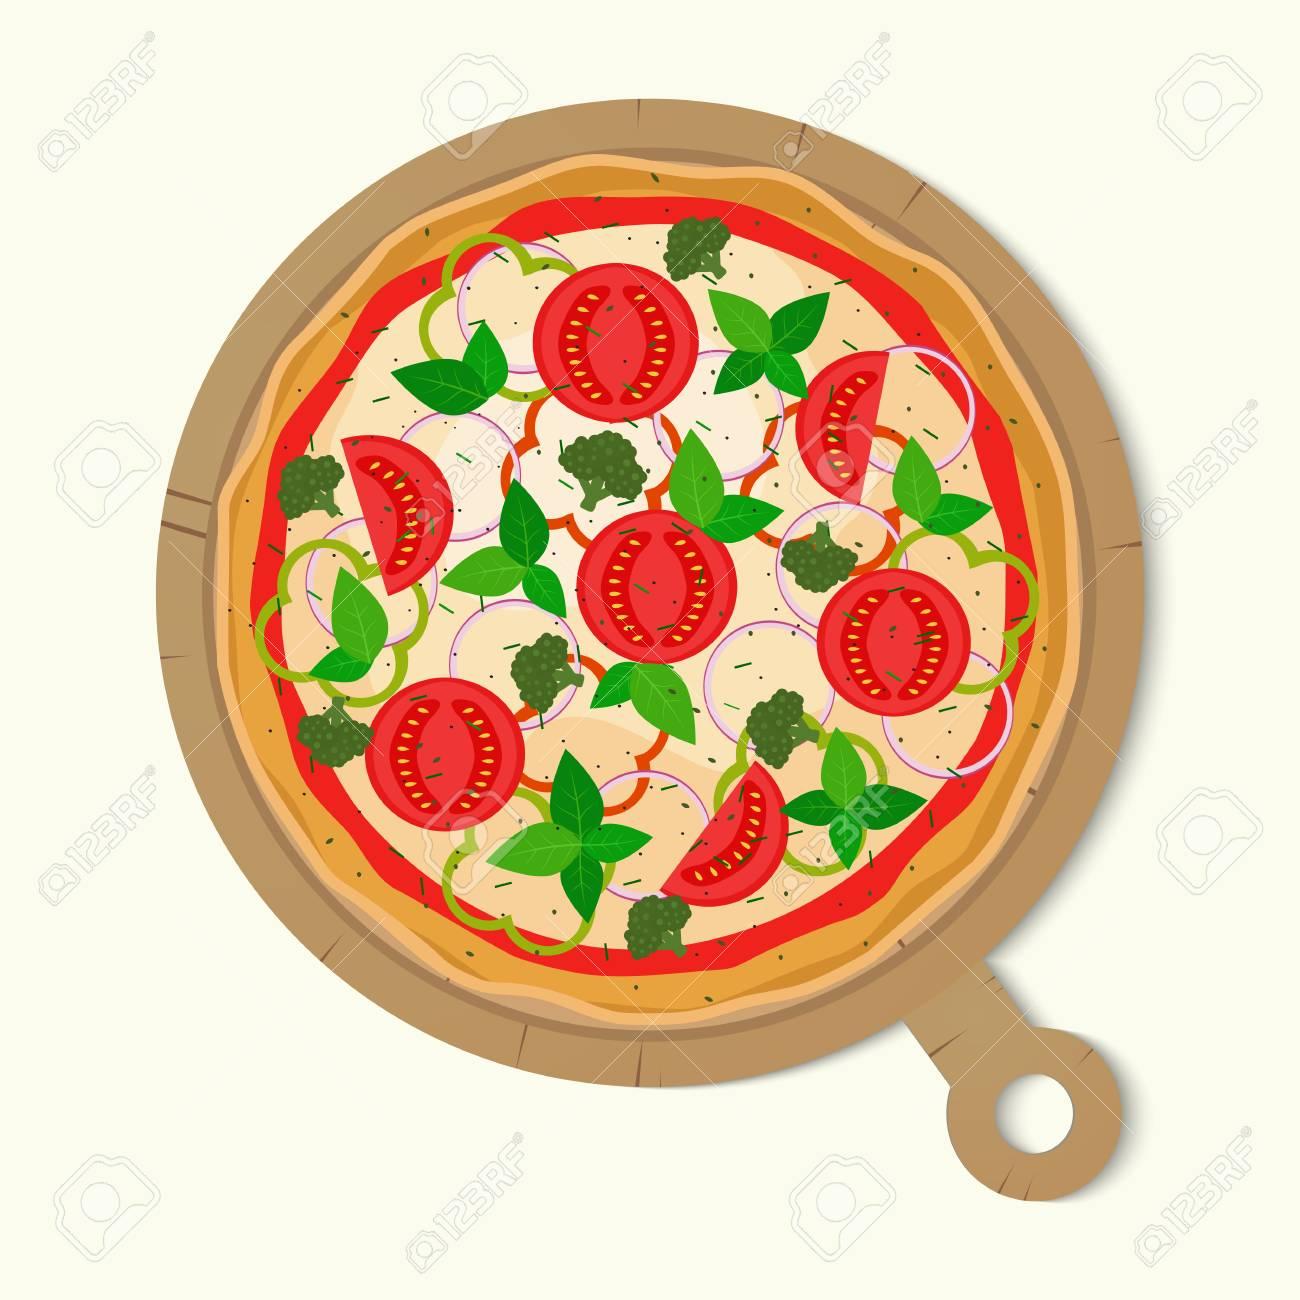 pizza vector illustration vegetarian pizza royalty free cliparts rh 123rf com pizza vectoriel gratuit pizza vectoriel gratuit